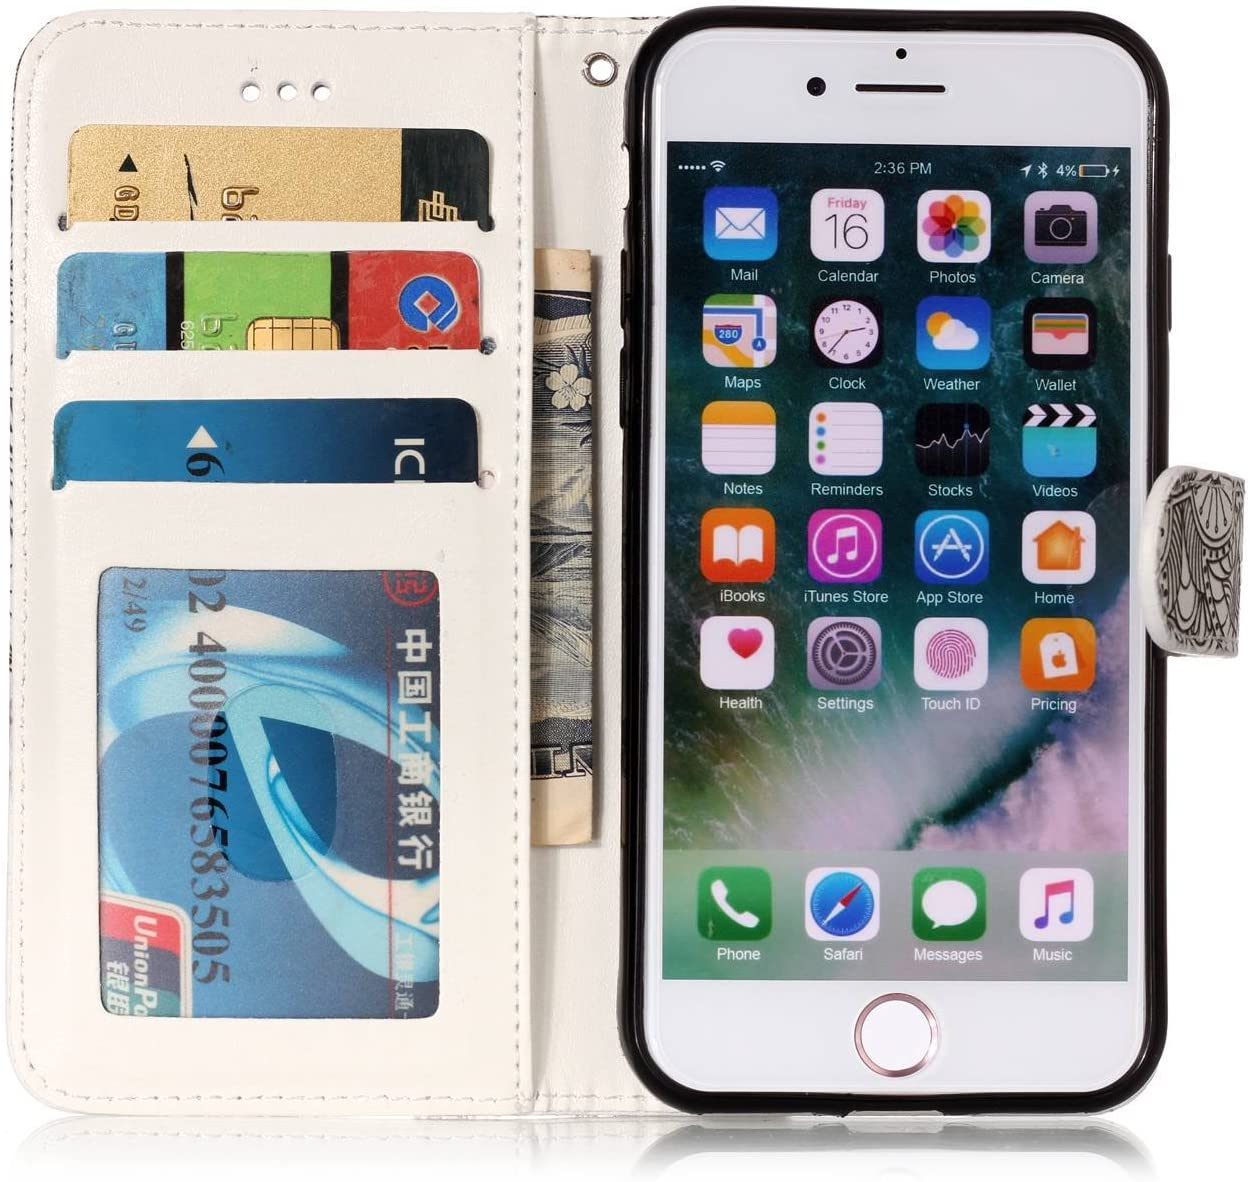 KM-Panda Housse Coque Apple iPhone 5 5S Se Marbre Mandala Henna Cuir PU Wallet Cover TPU Silicone /Étui Portefeuille Flip Case